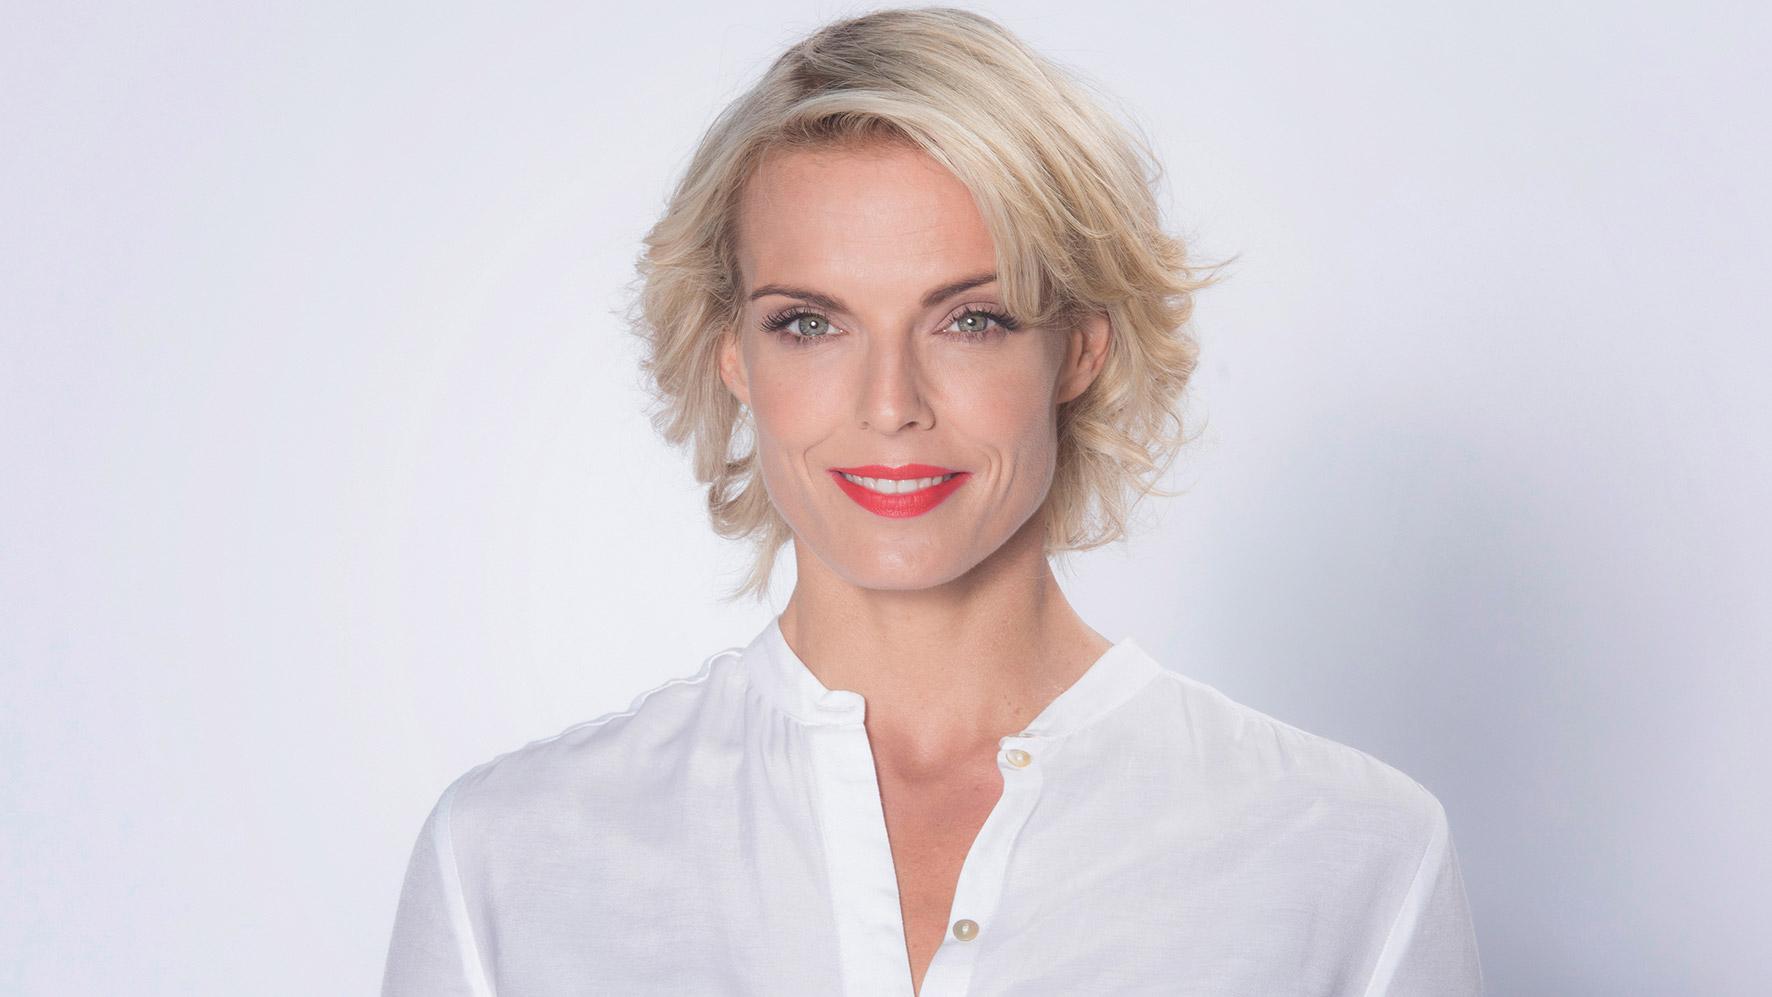 Stéphanie Berger 2017